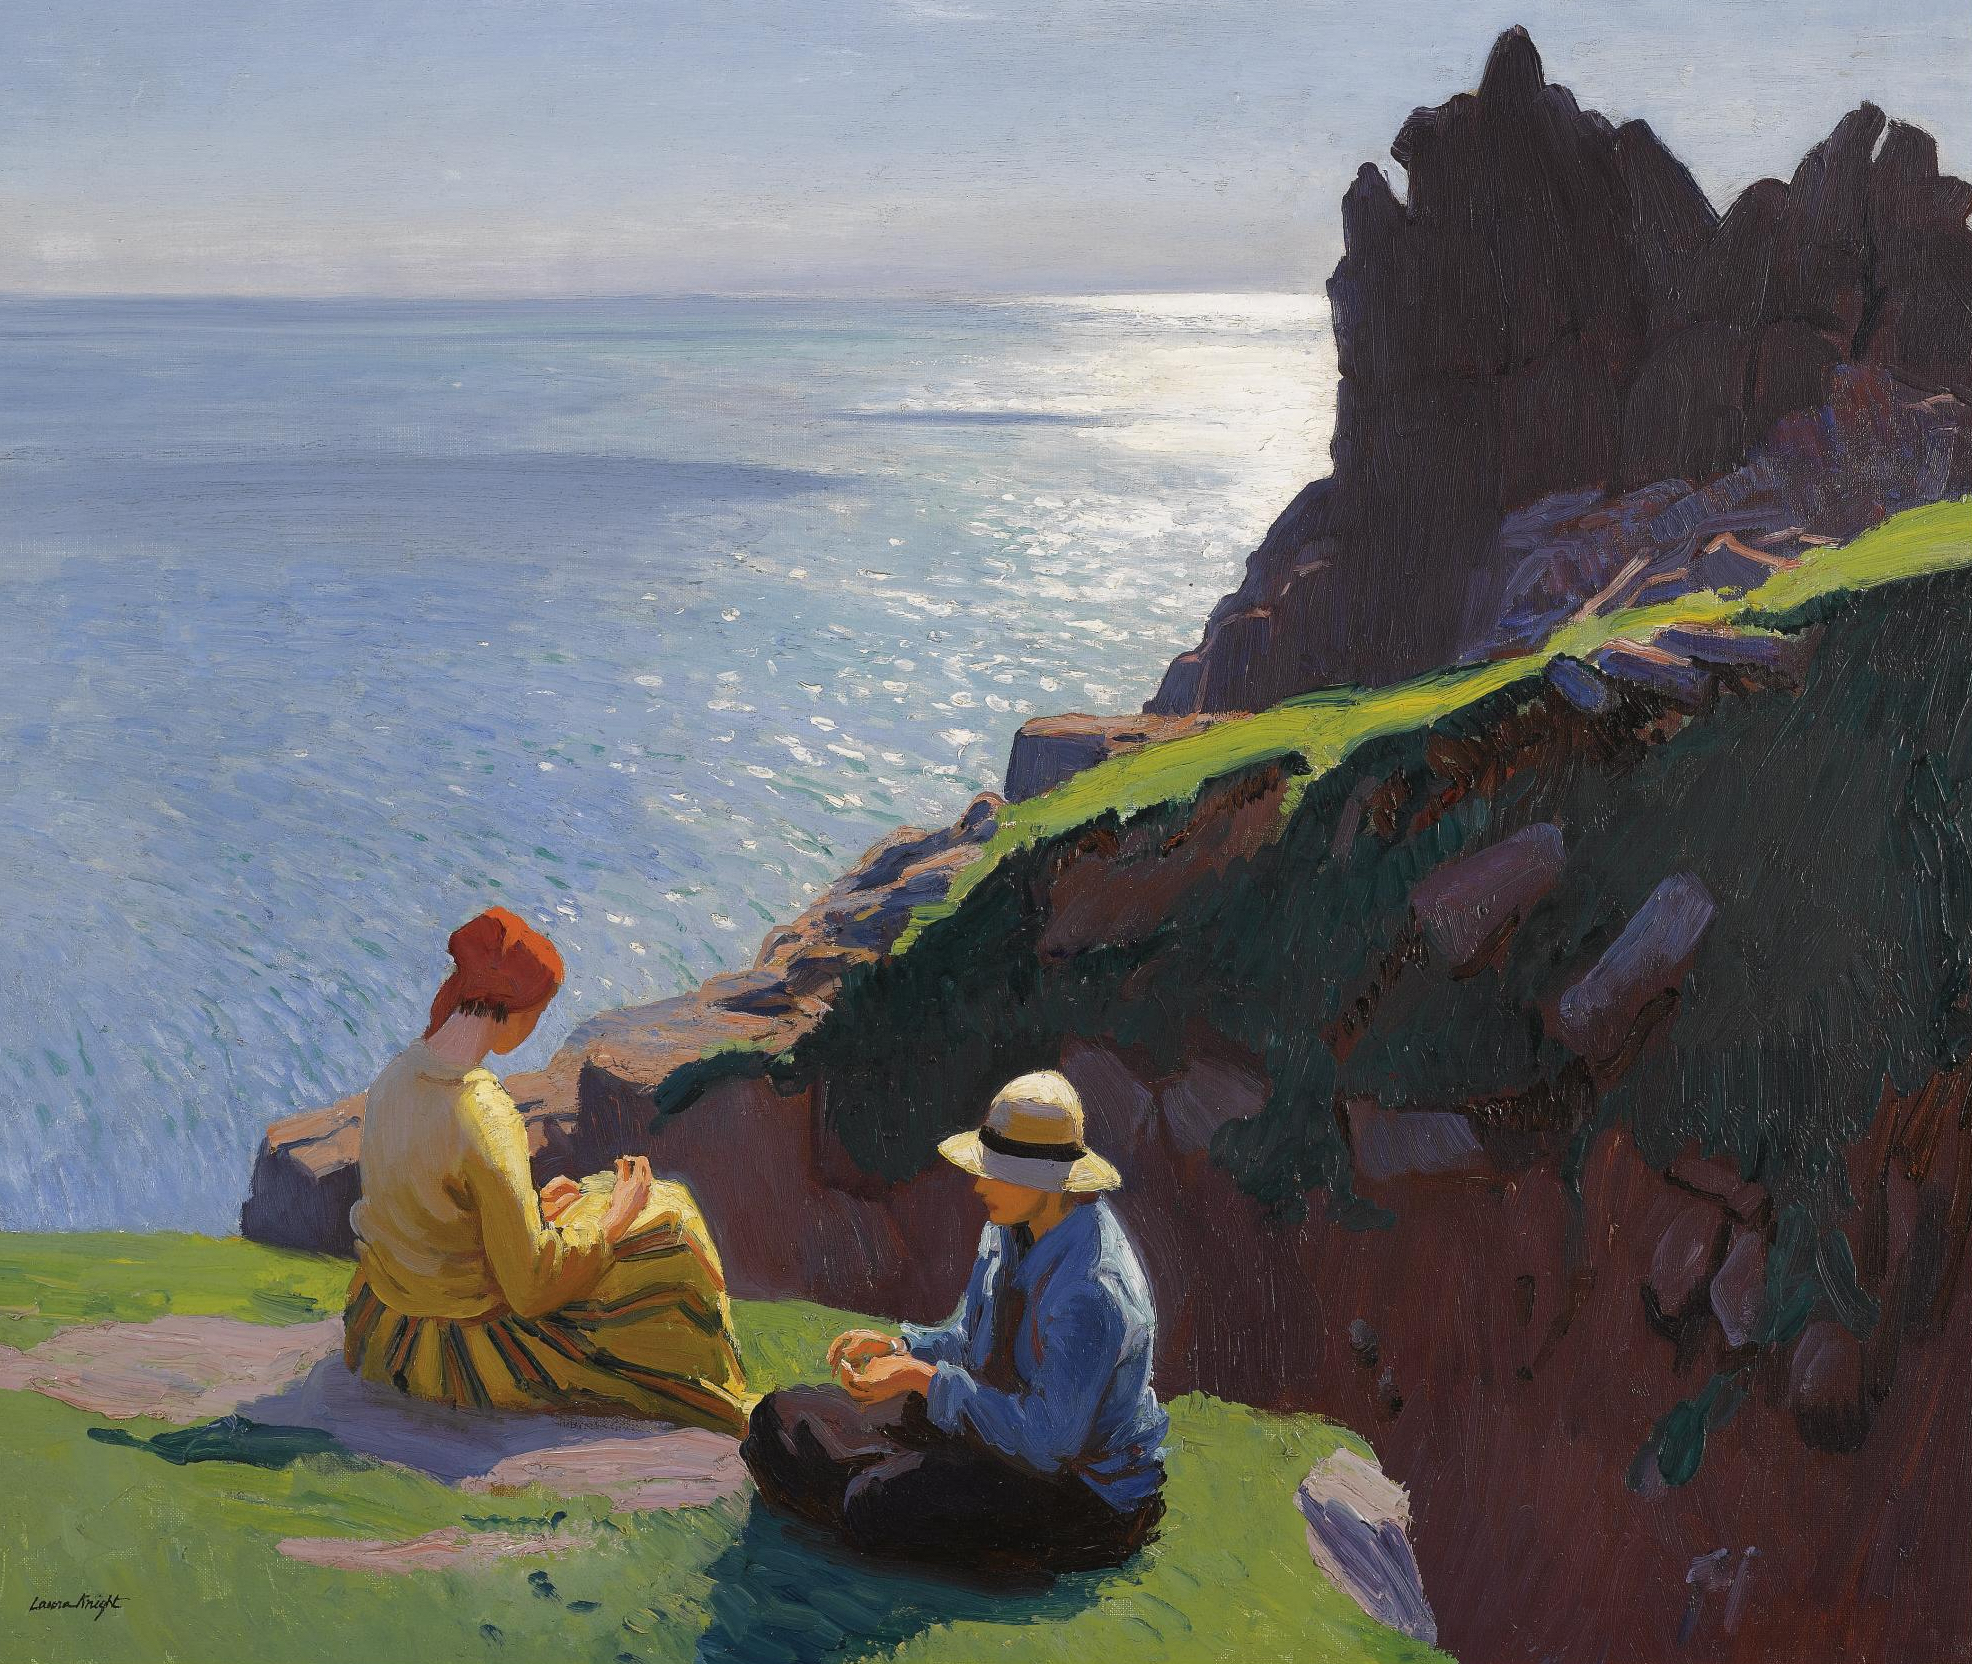 Laura Knight,  On the Cliffs,  1917, oil on canvas, 63.5x76cm, Sotheby's.   http://www.sothebys.com/en/auctions/ecatalogue/lot.85.html/2009/victorian-edwardian-art-l09688